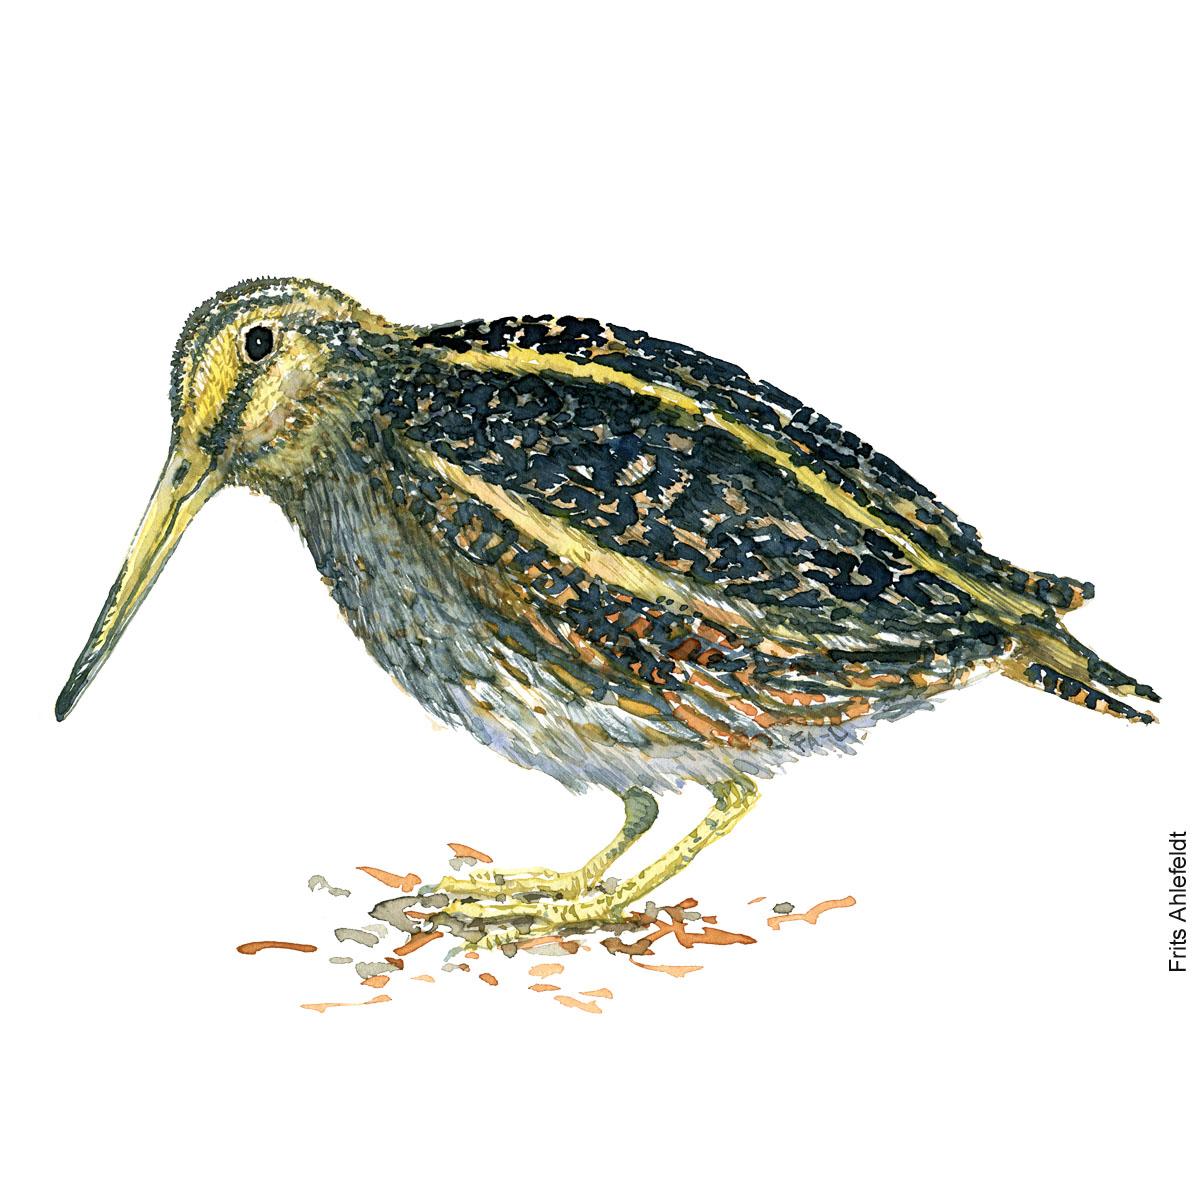 Jack snipe. Bird watercolour illustration handmade by Frits Ahlefeldt